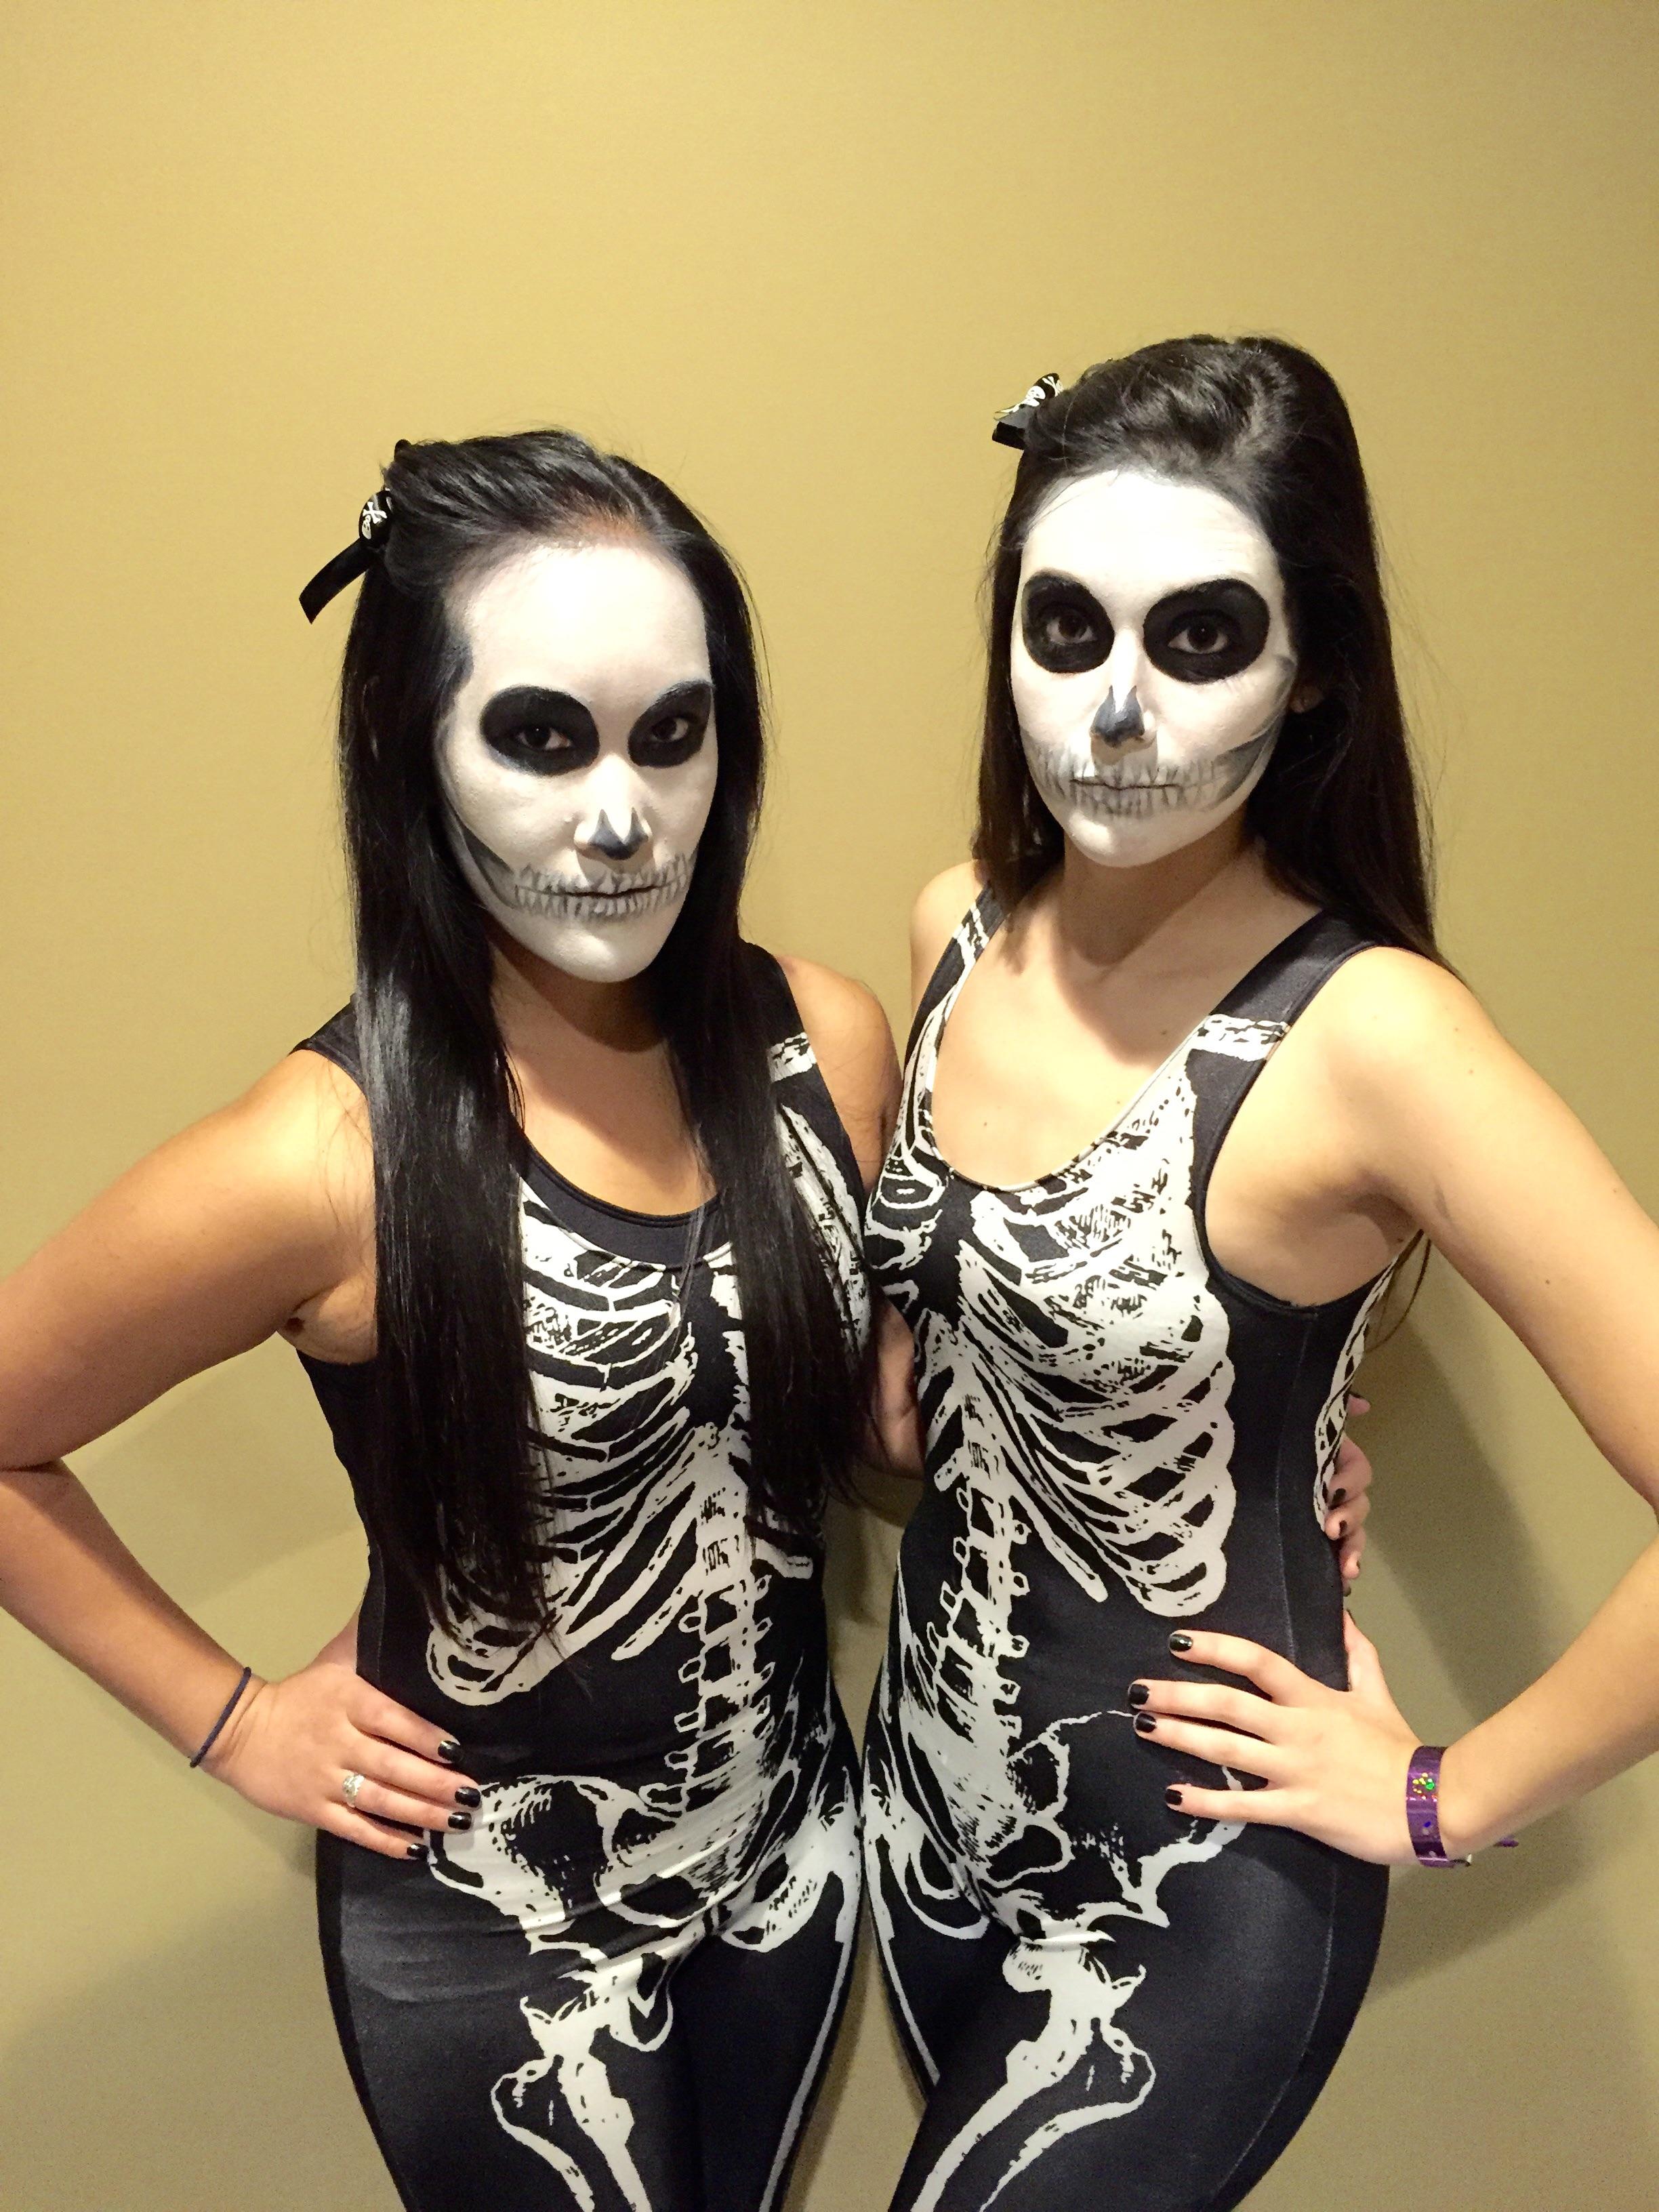 Halloween Hair and Makeup - Skeletons